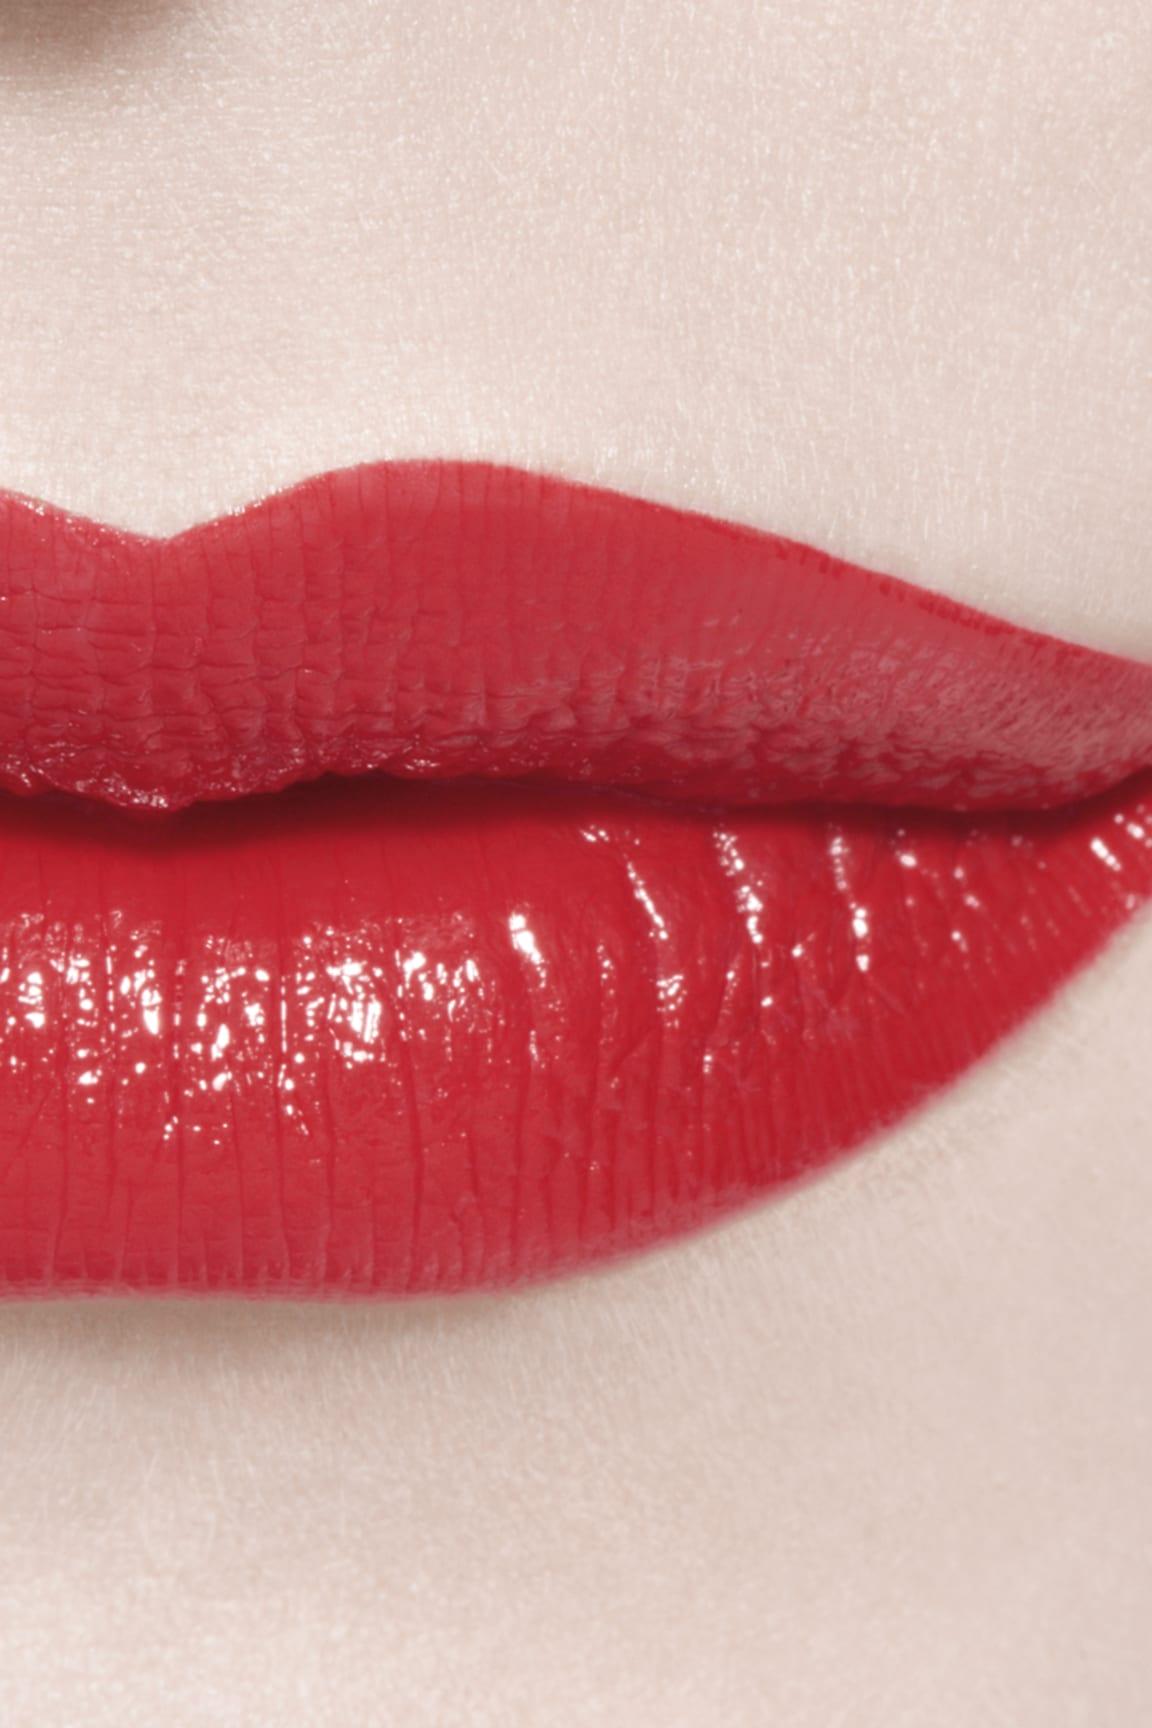 Anwendung Make-up-Bild 3 - ROUGE COCO BLOOM 130 - BLOSSOM